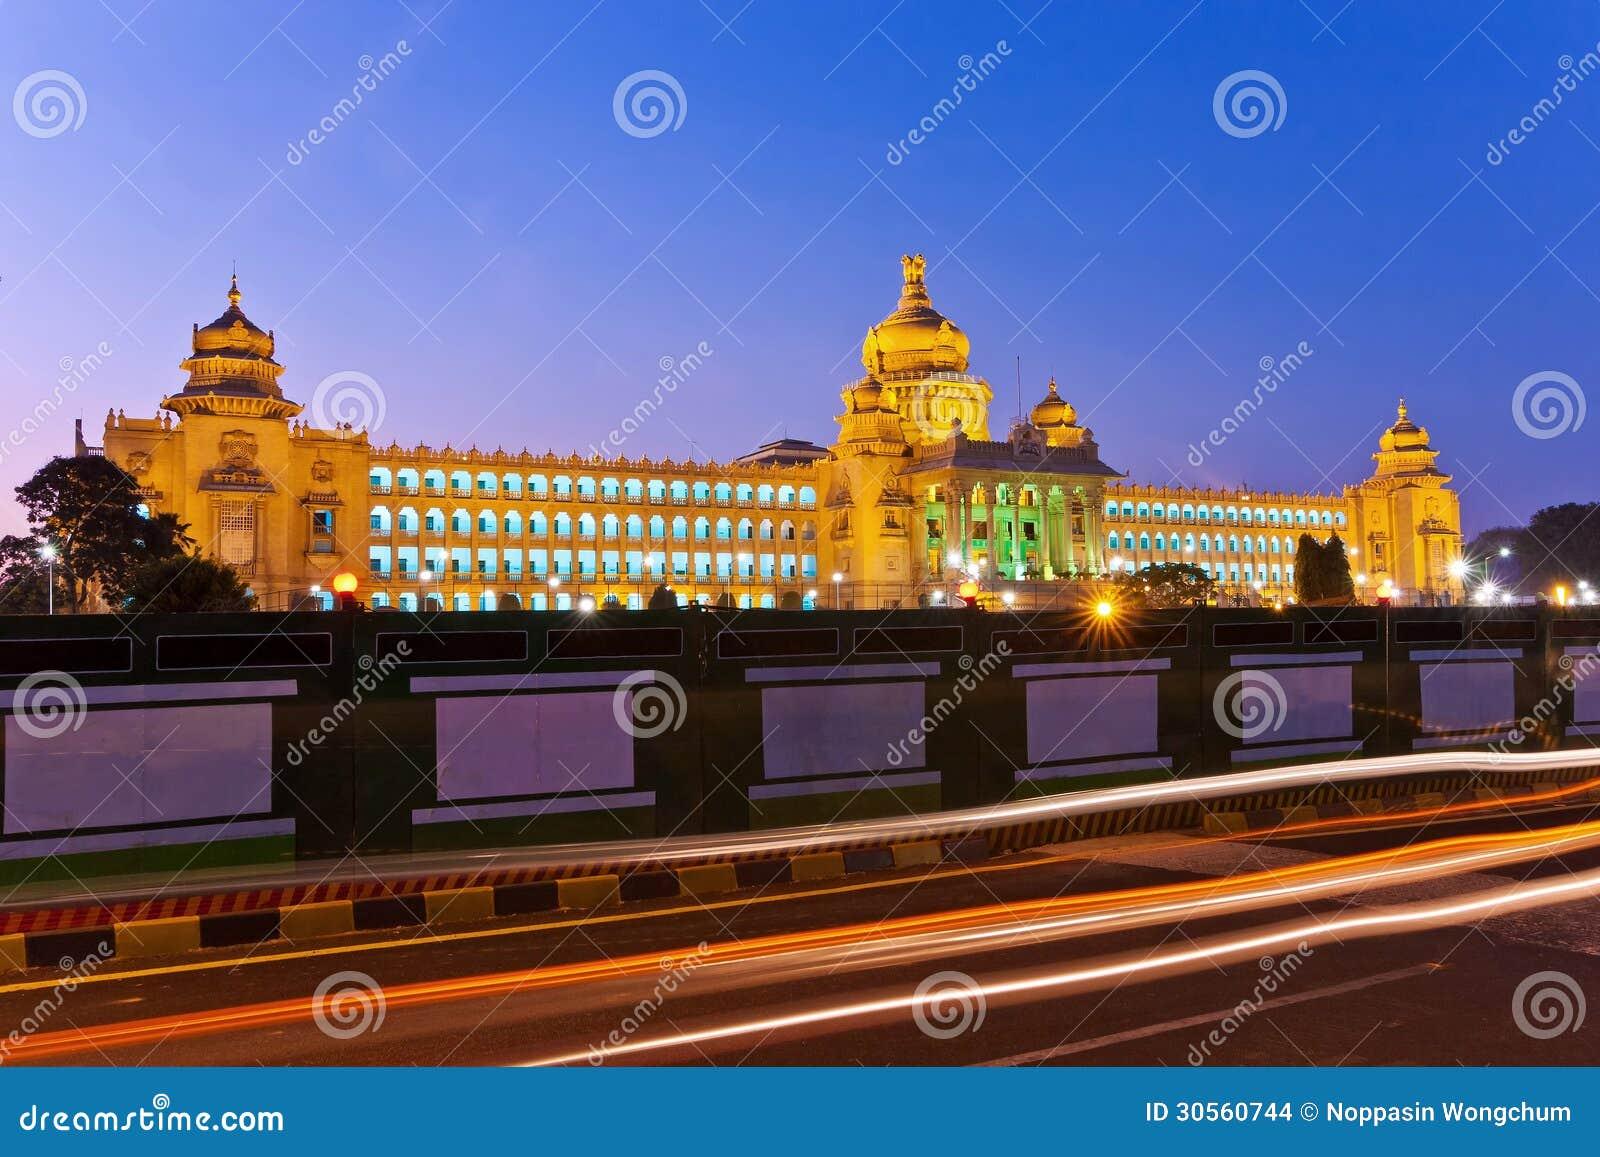 Vidhana Soudha die staatliche Gesetzgebung